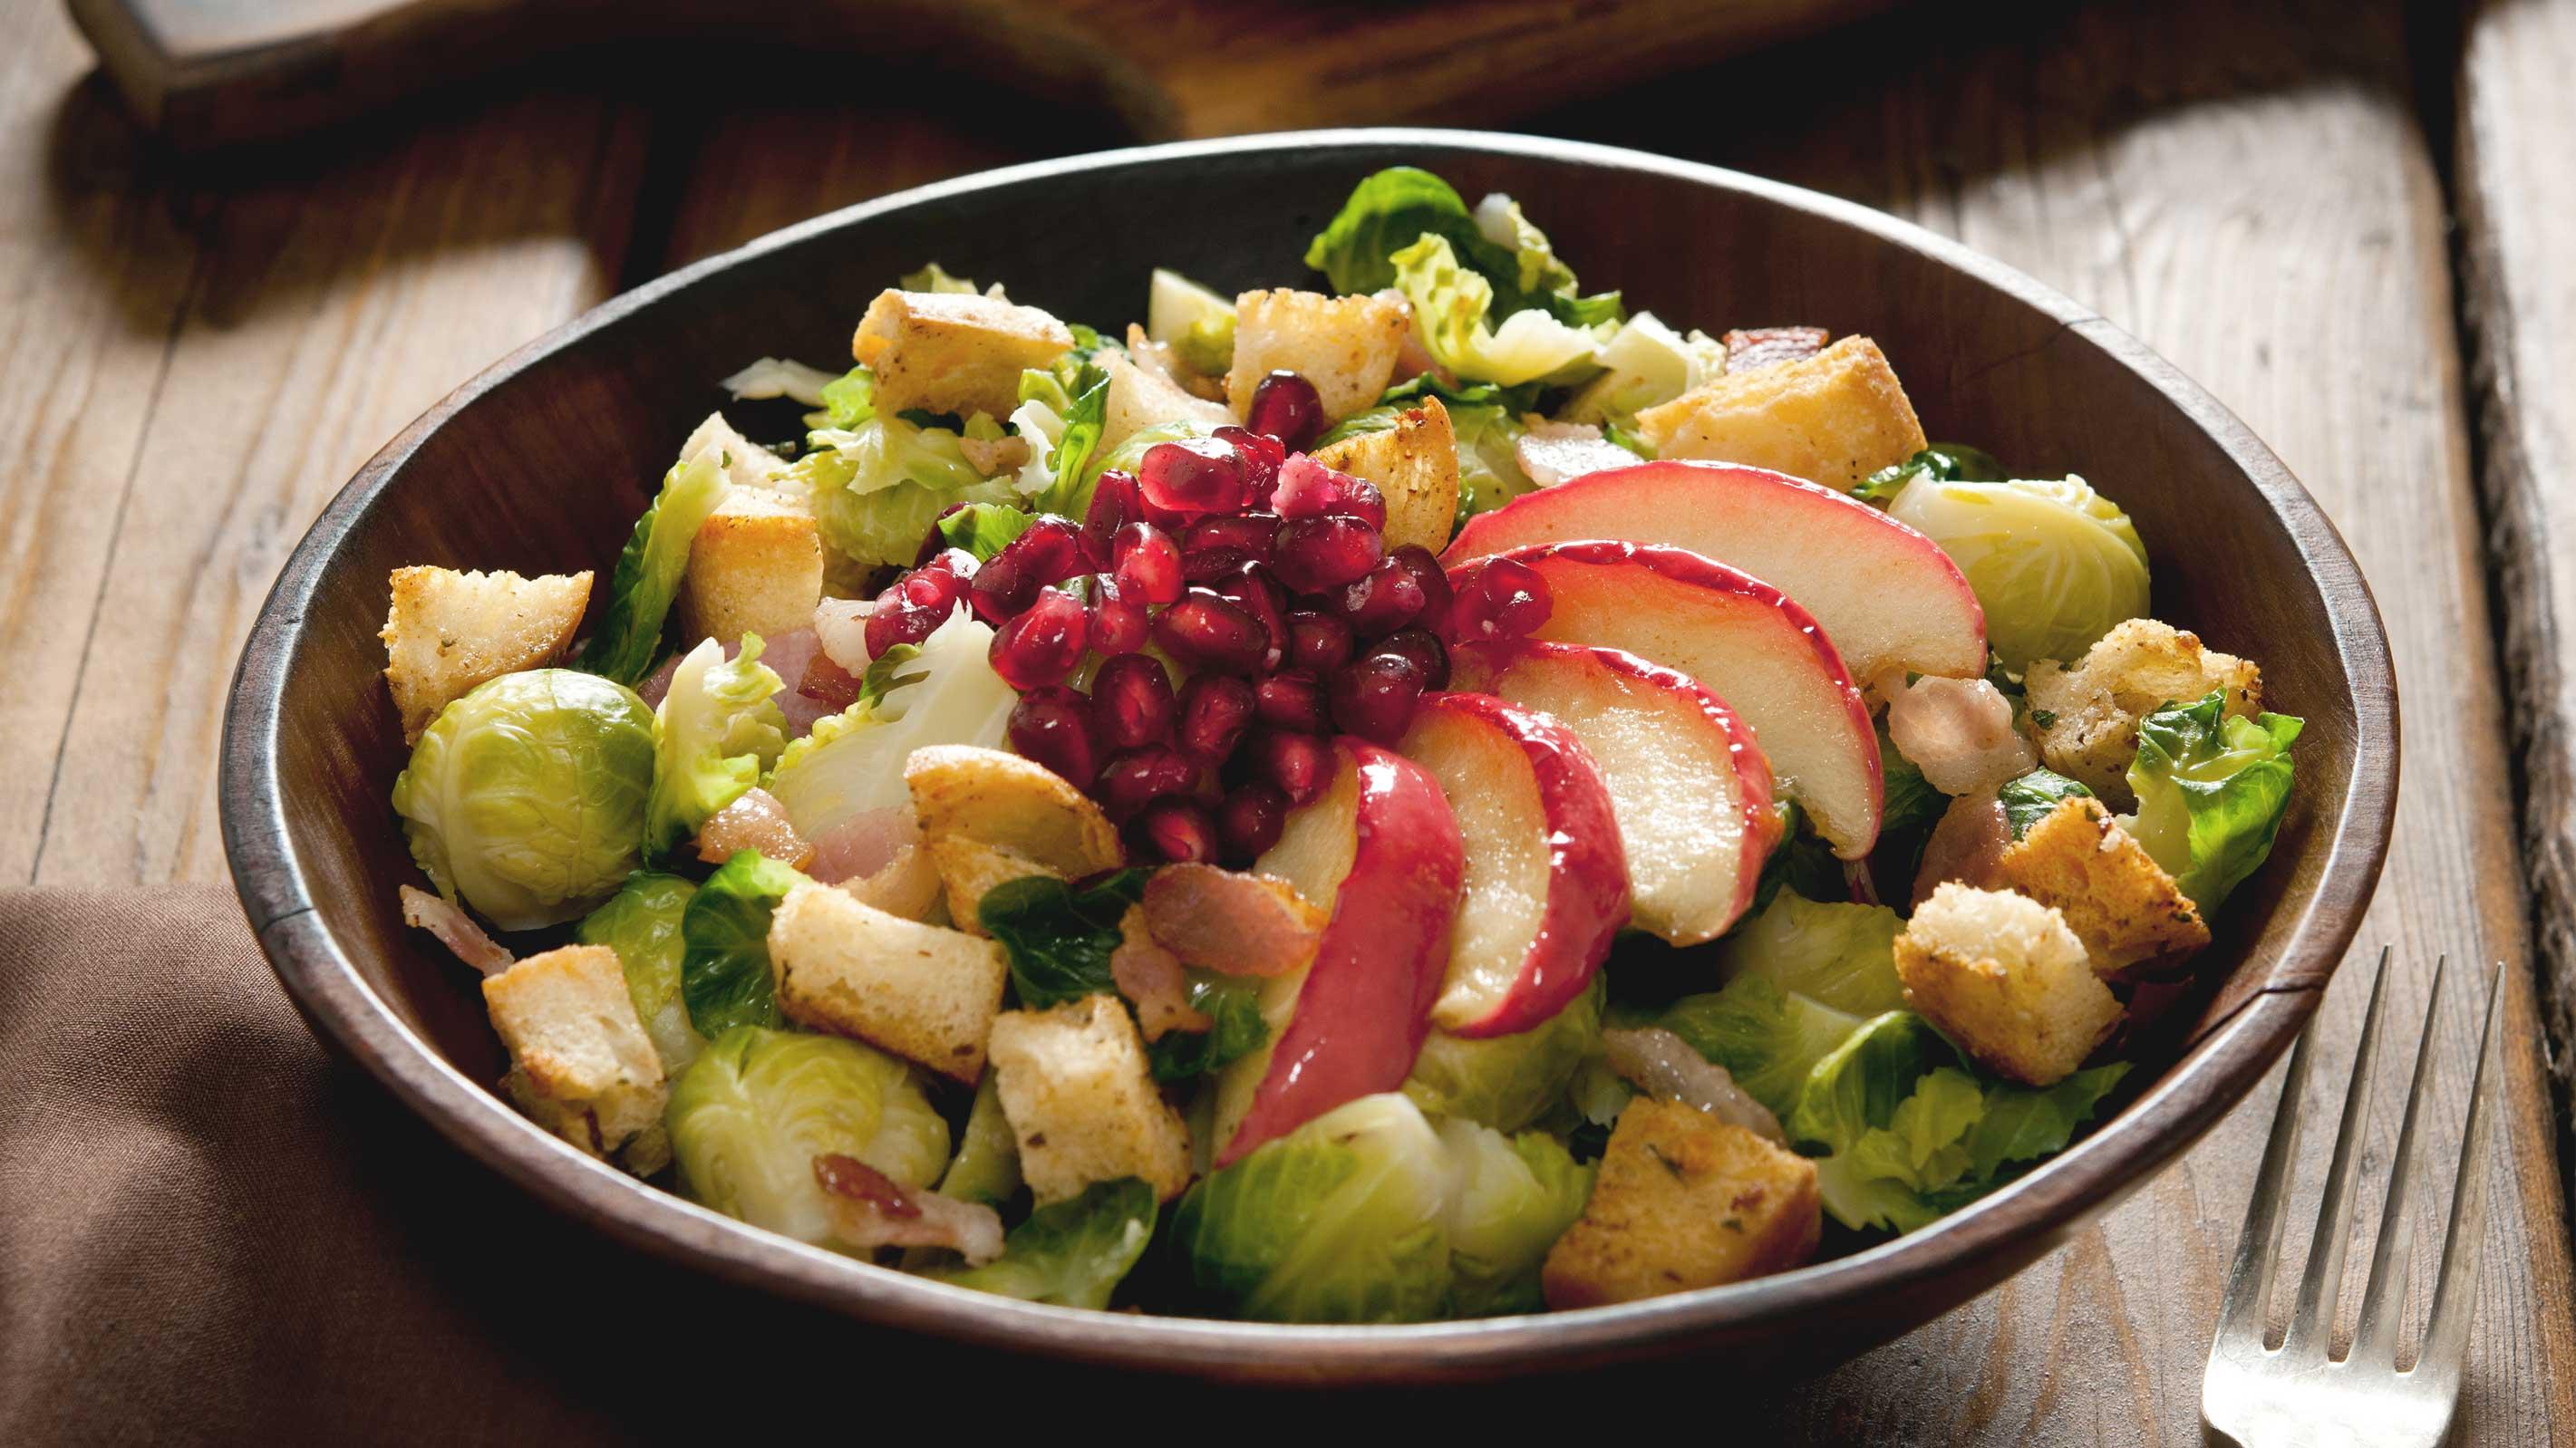 Apfelrezepte: Salat mit Apfel und Rosenkohl